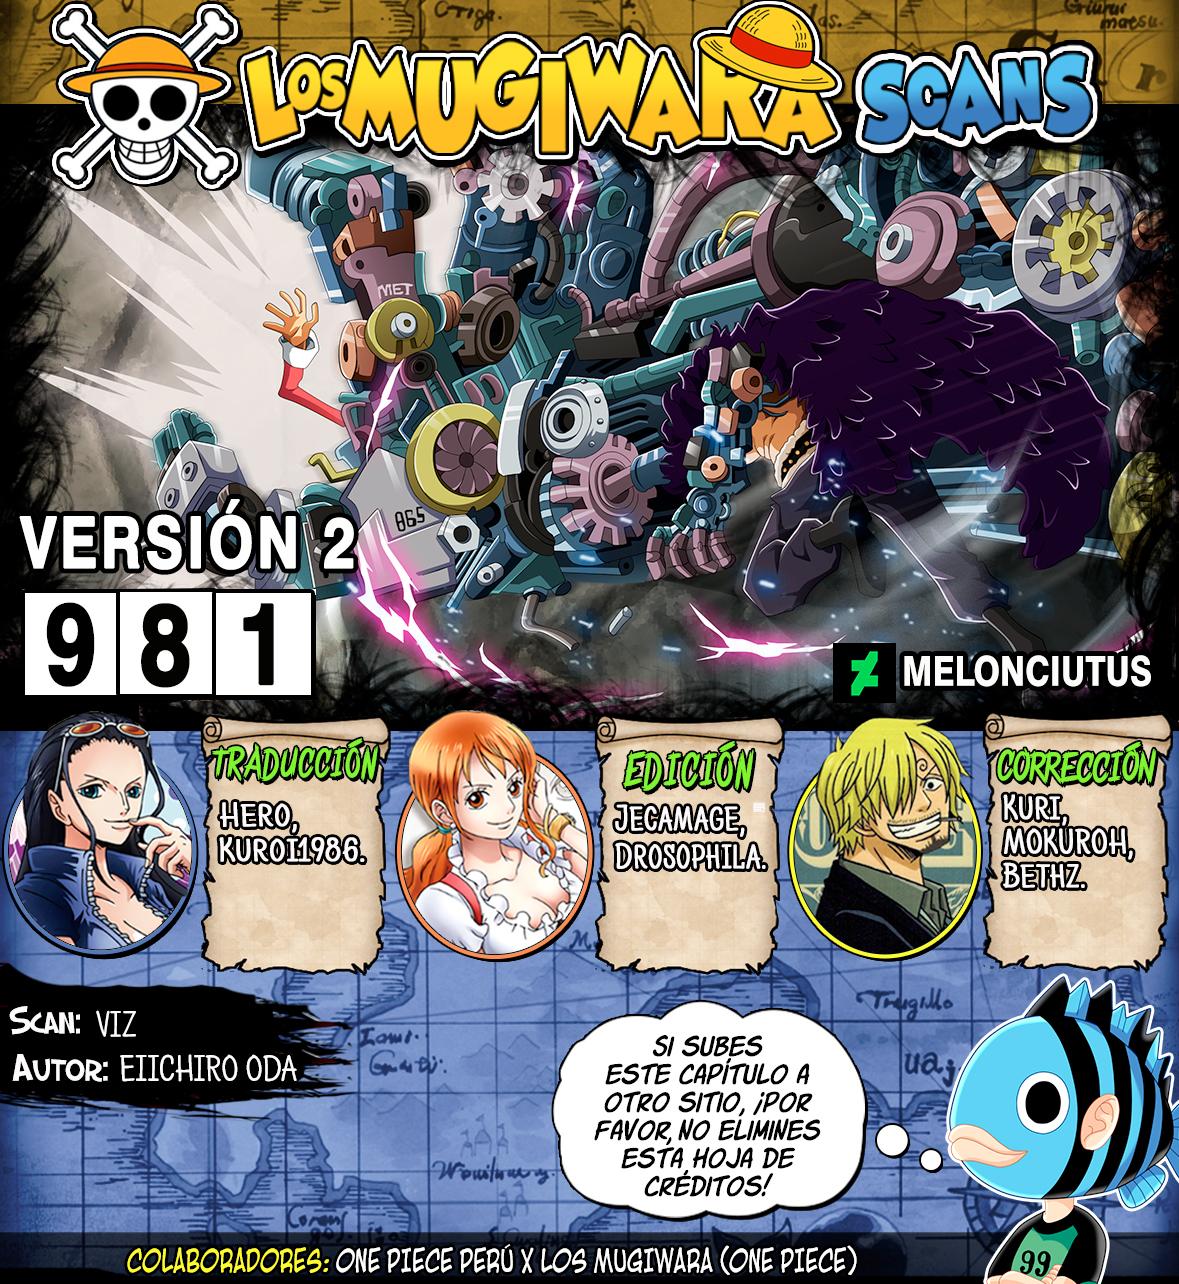 One Piece Manga 981 [Español] [Mugiwara Scans V2] 00